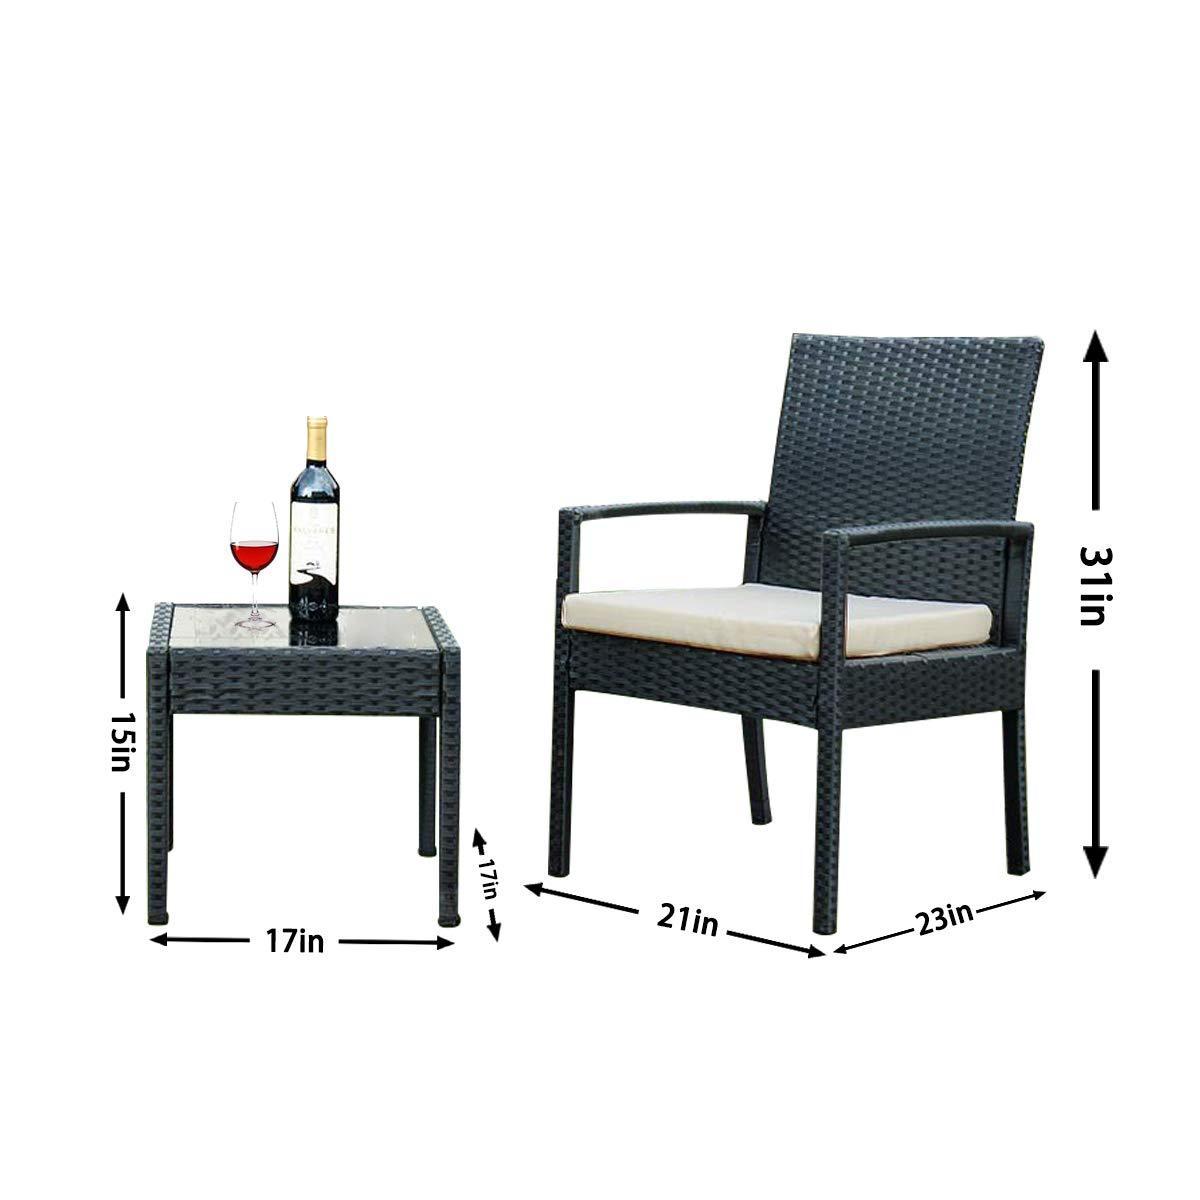 Bartfort Rattan Wicker Garden Furniture Set 3 Piece Patio Outdoor Rattan Patio Set Includes Cushion One Glass Table